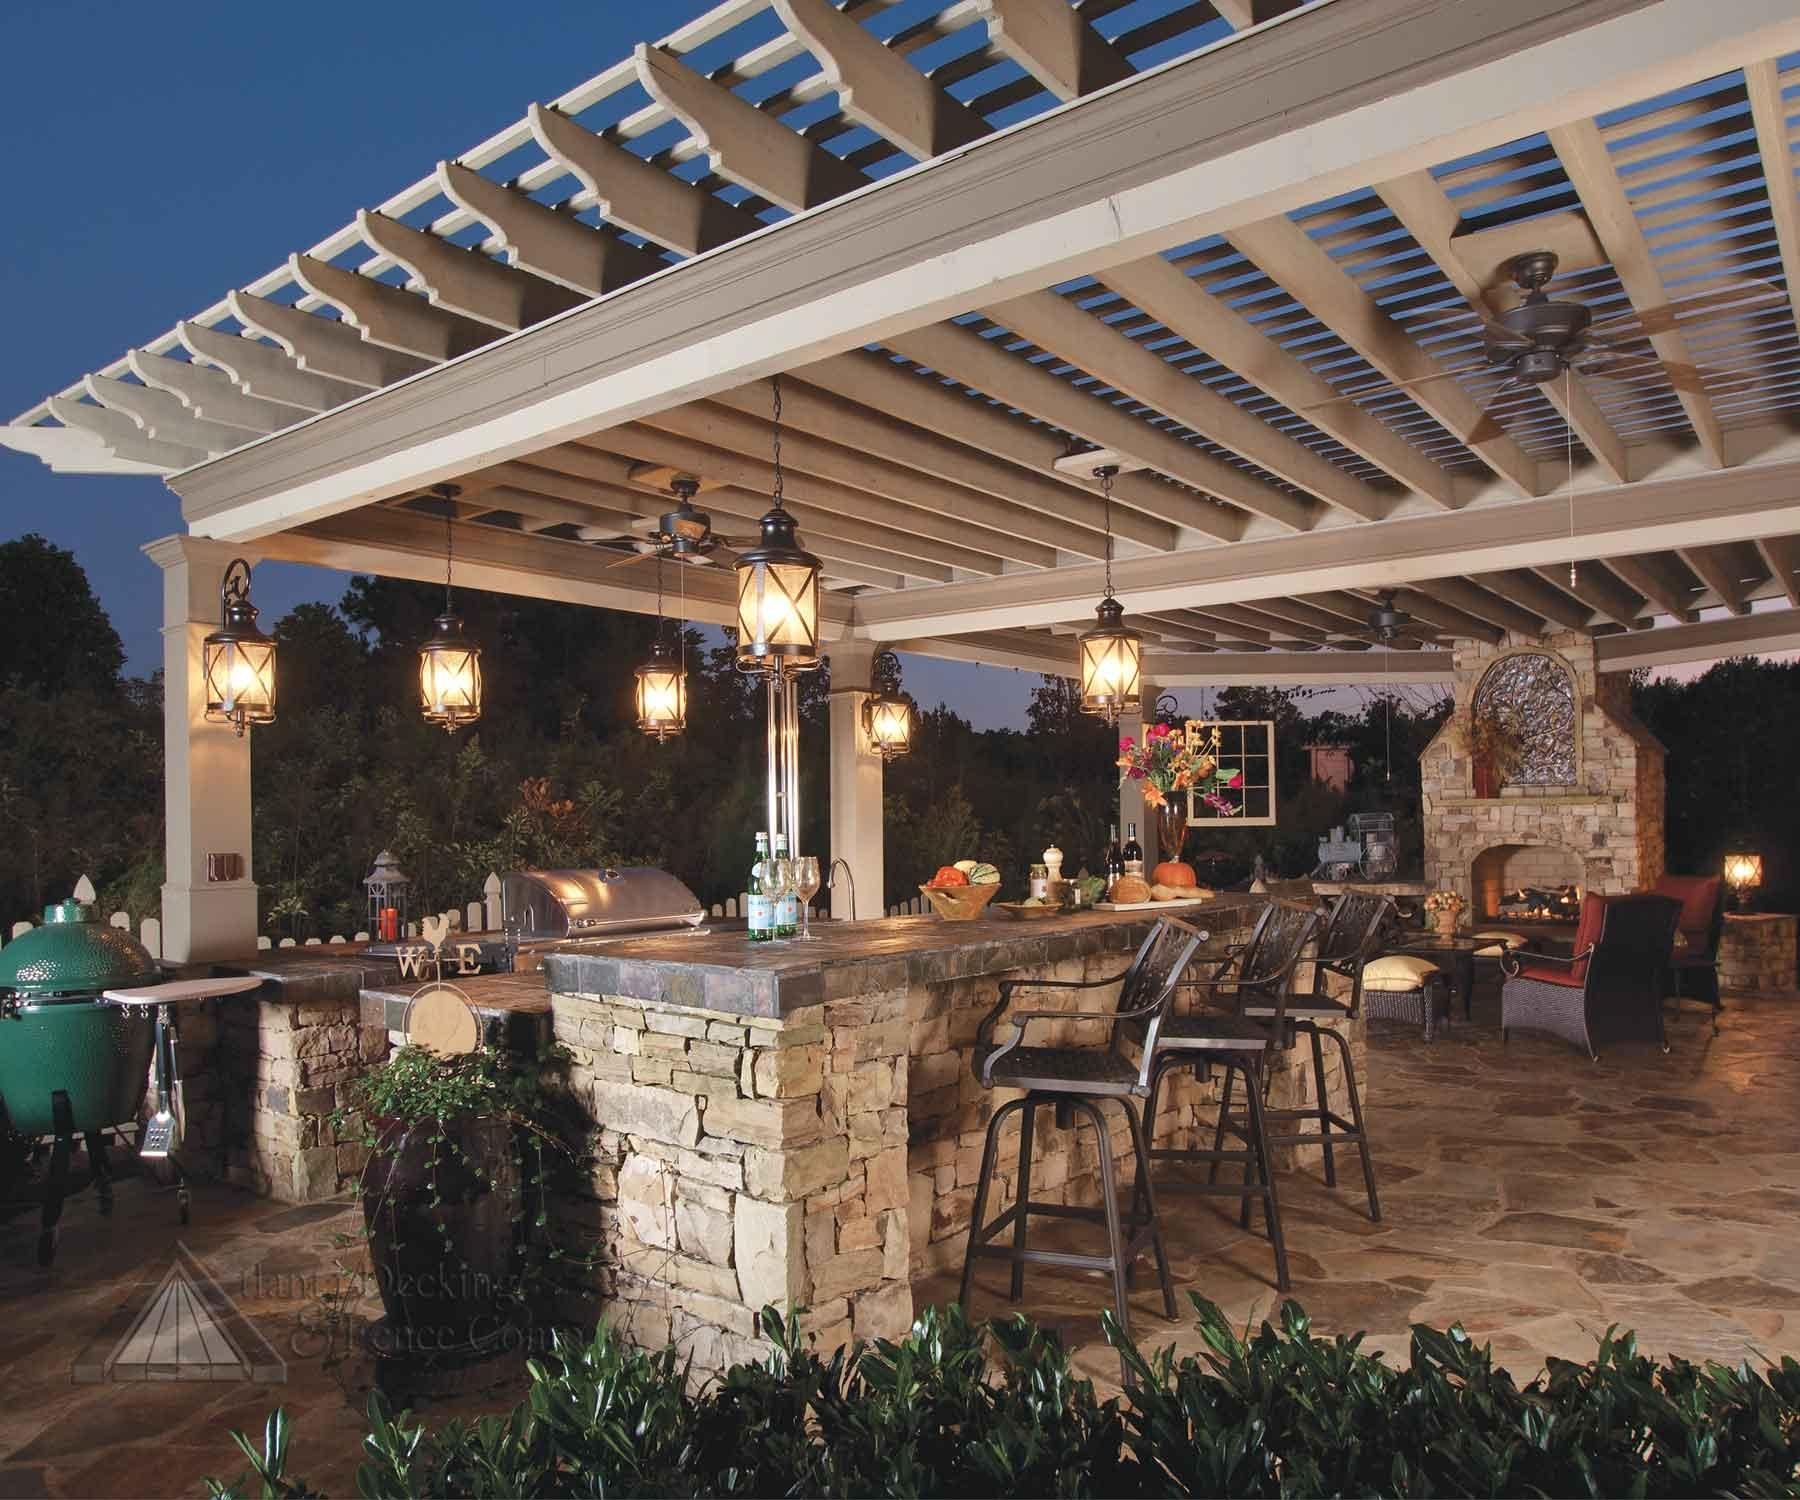 Inspiration about Pendant Lighting Outdoor Kitchen With Pergola – Alfresco Australia Regarding Outdoor Hanging Bar Lights (#14 of 15)